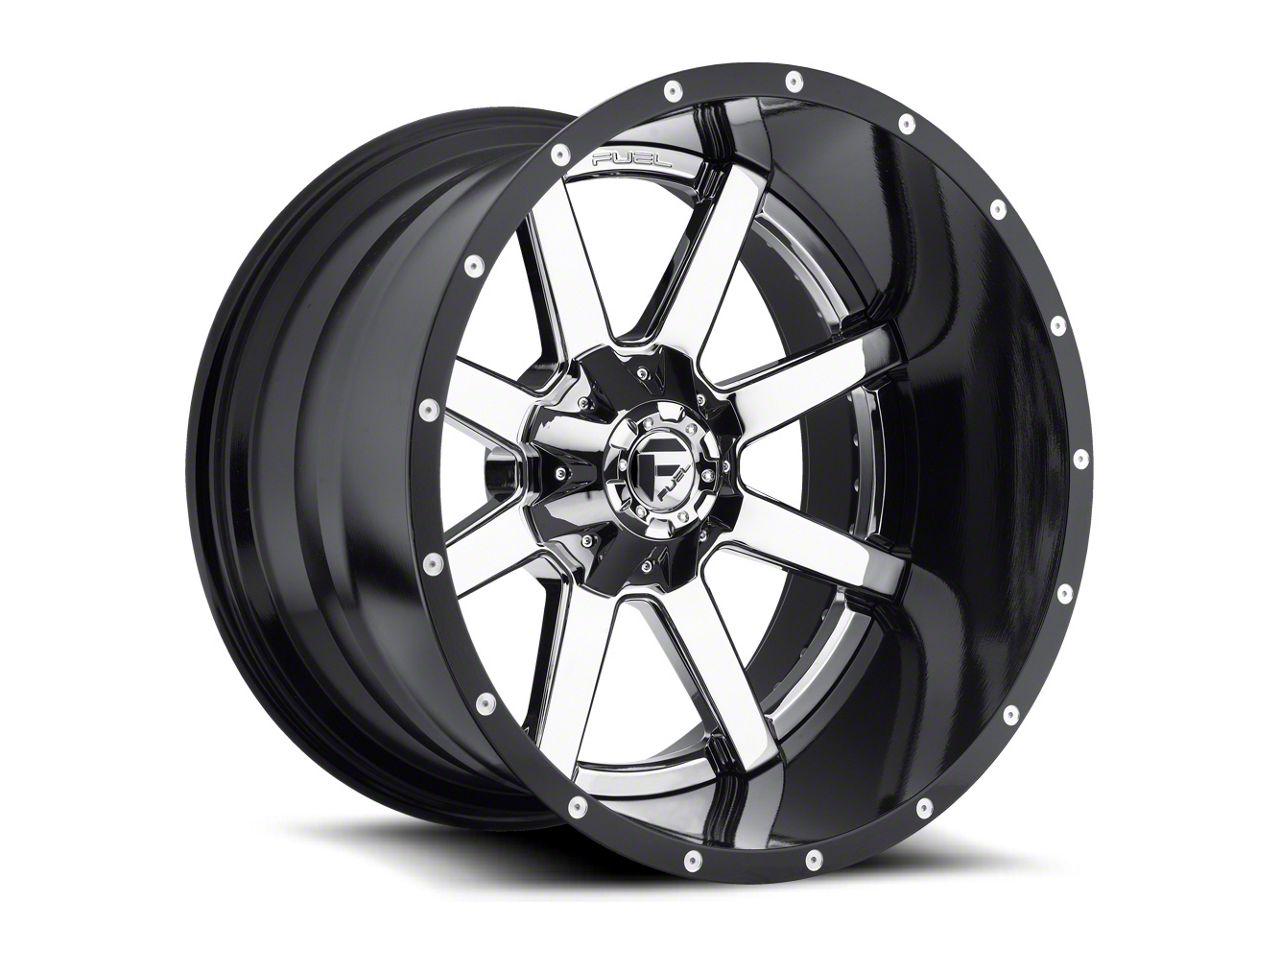 Fuel Wheels Maverick Chrome 5-Lug Wheel - 24x12 (02-18 RAM 1500, Excluding Mega Cab)